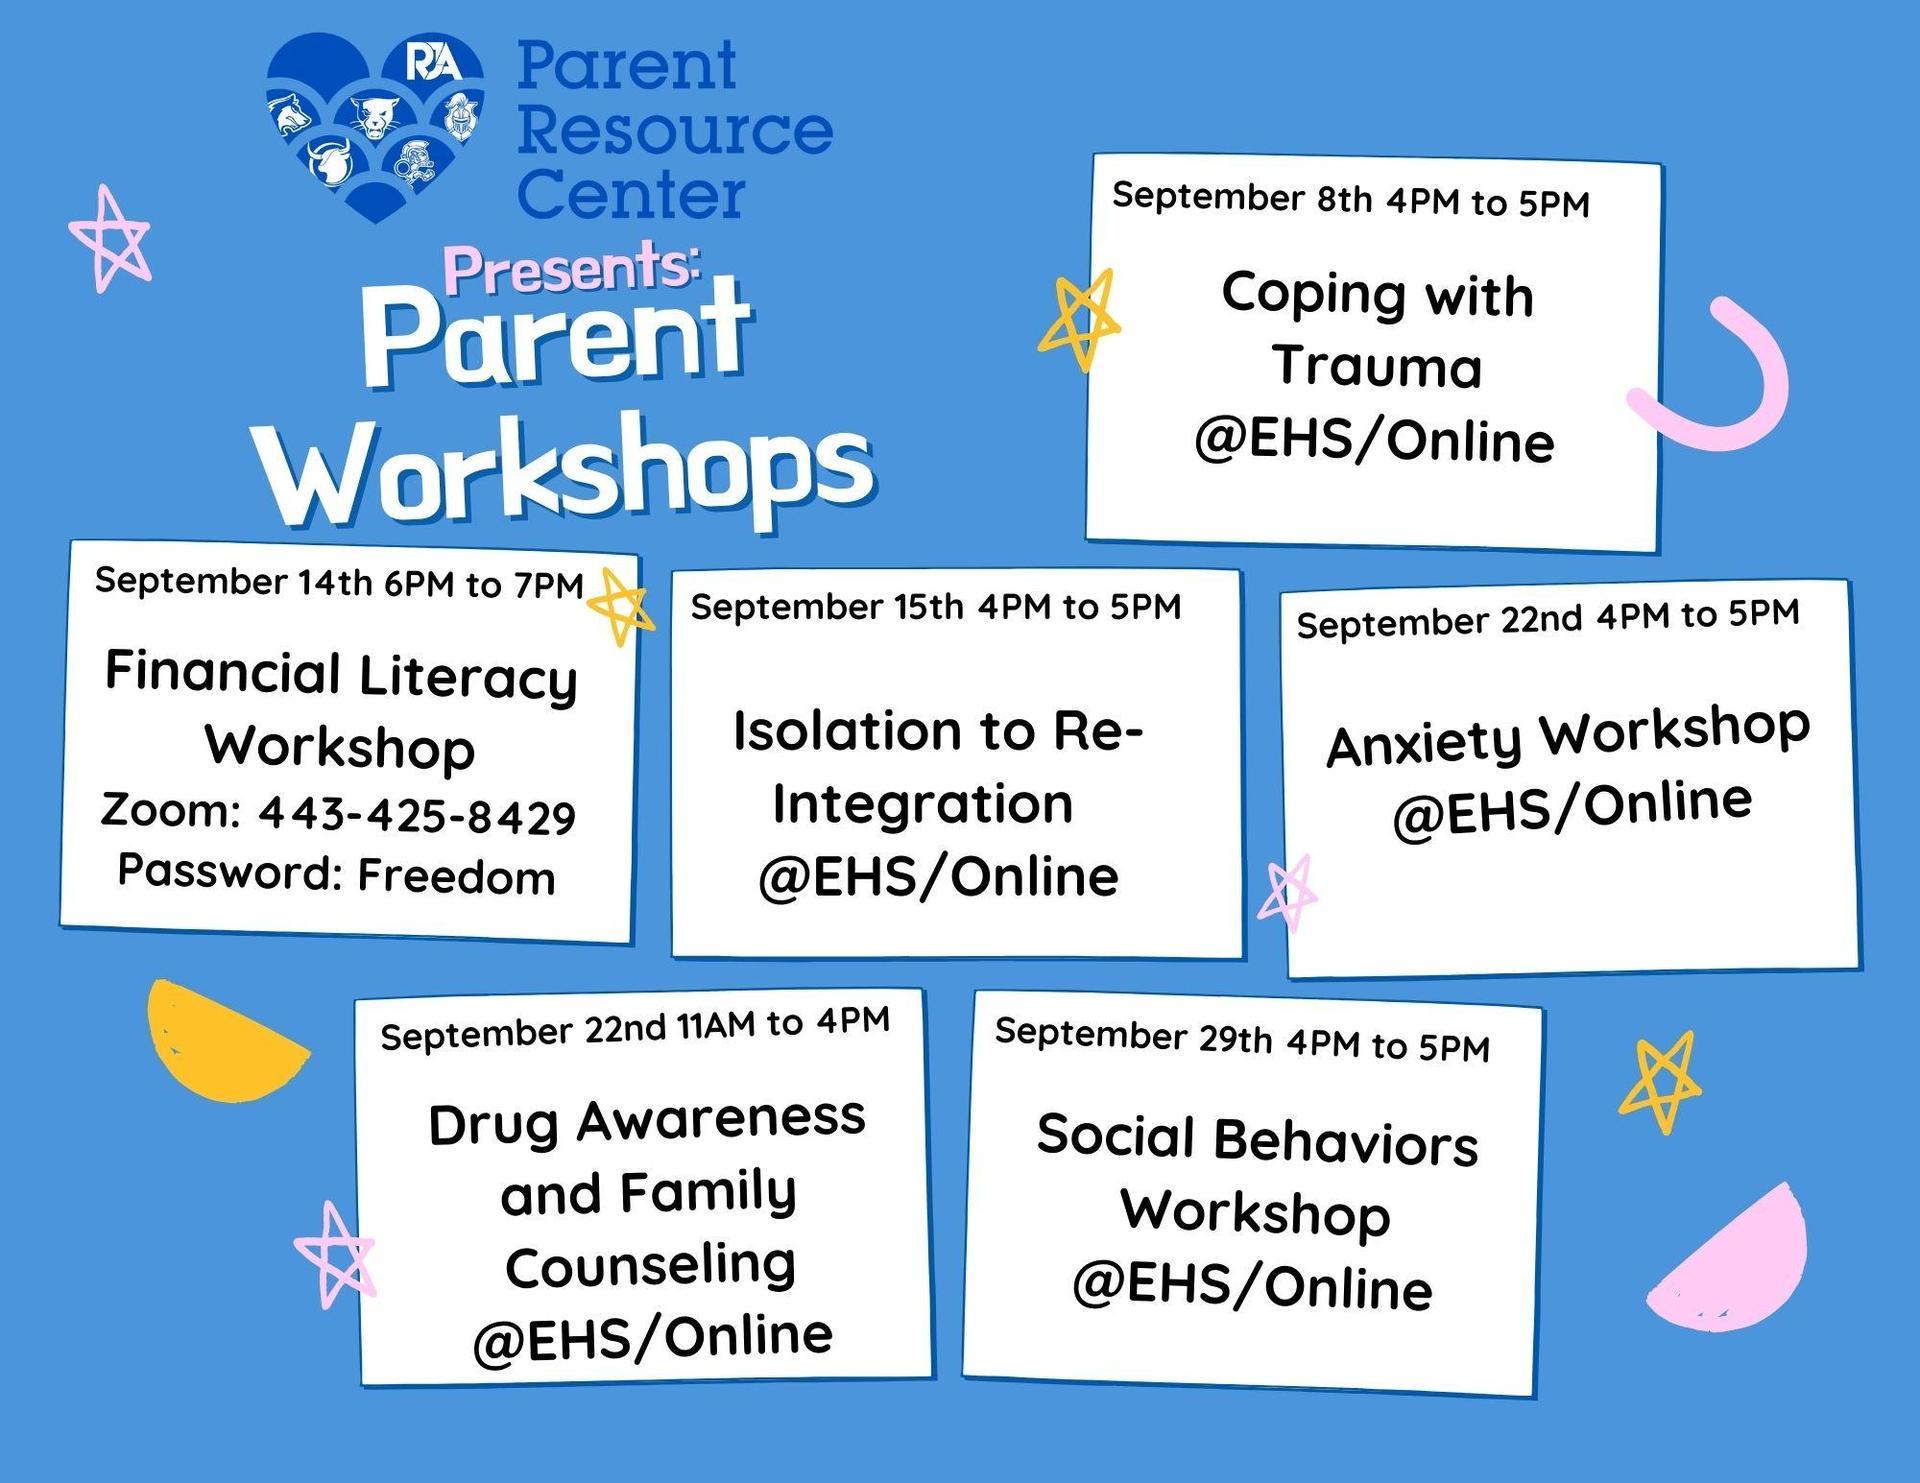 RJA Parent Center presents Parent University. Free workshops for the month of September